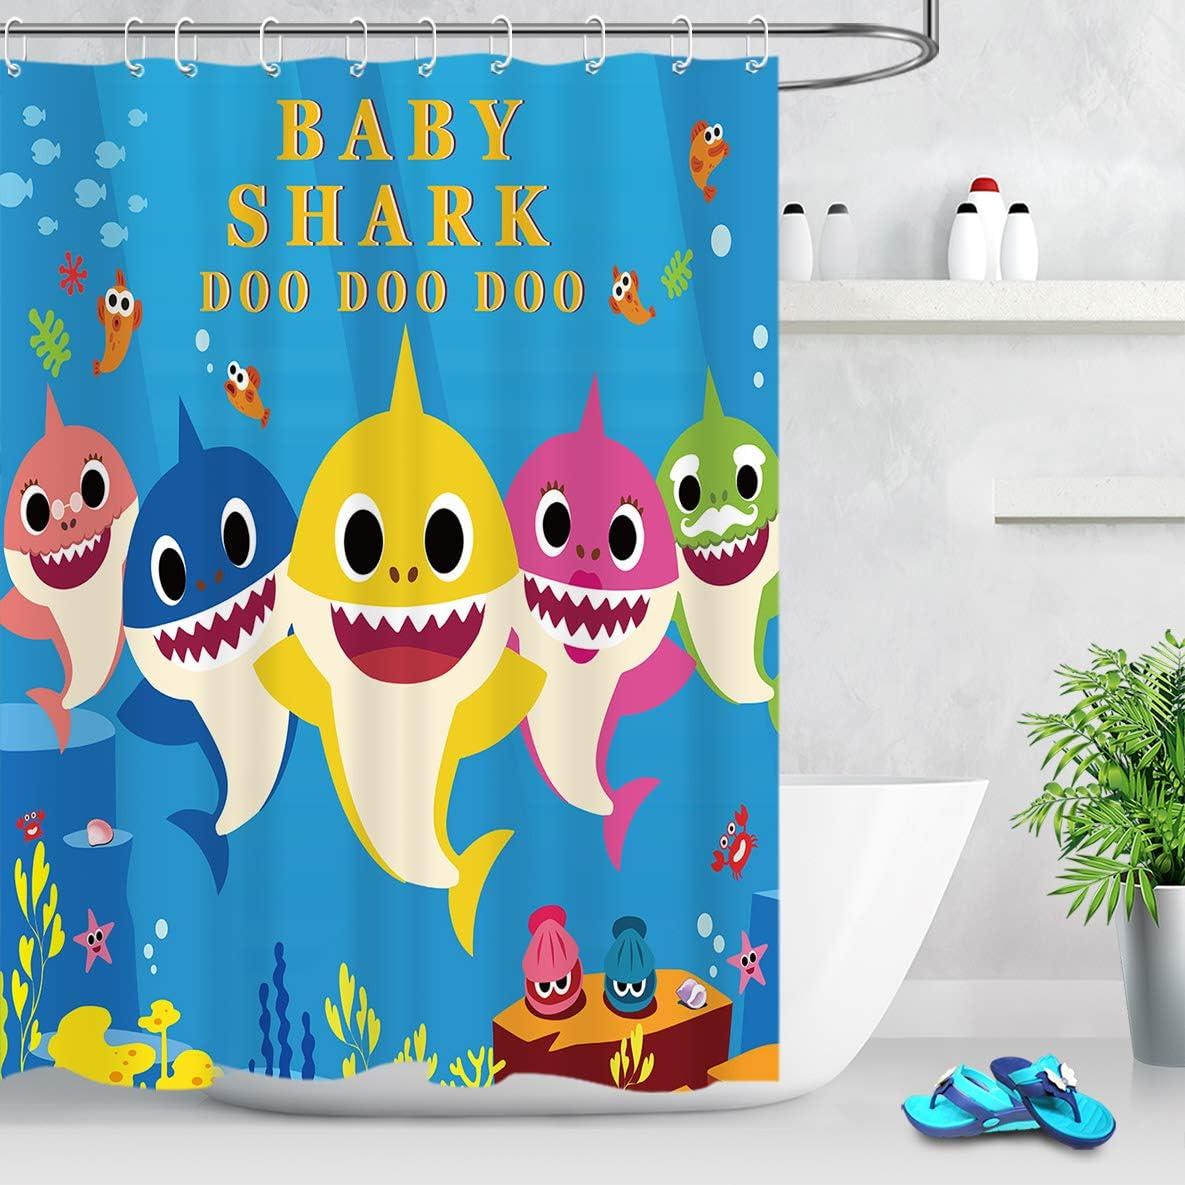 LB Cute Cartoon Fish Shower Curtain Blue Underwater Sea World Starfish Coral Reefs Kids Bathroom Curtain Decor Hooks Included,60x72 inch Polyester Fabric Waterproof,10 Holes